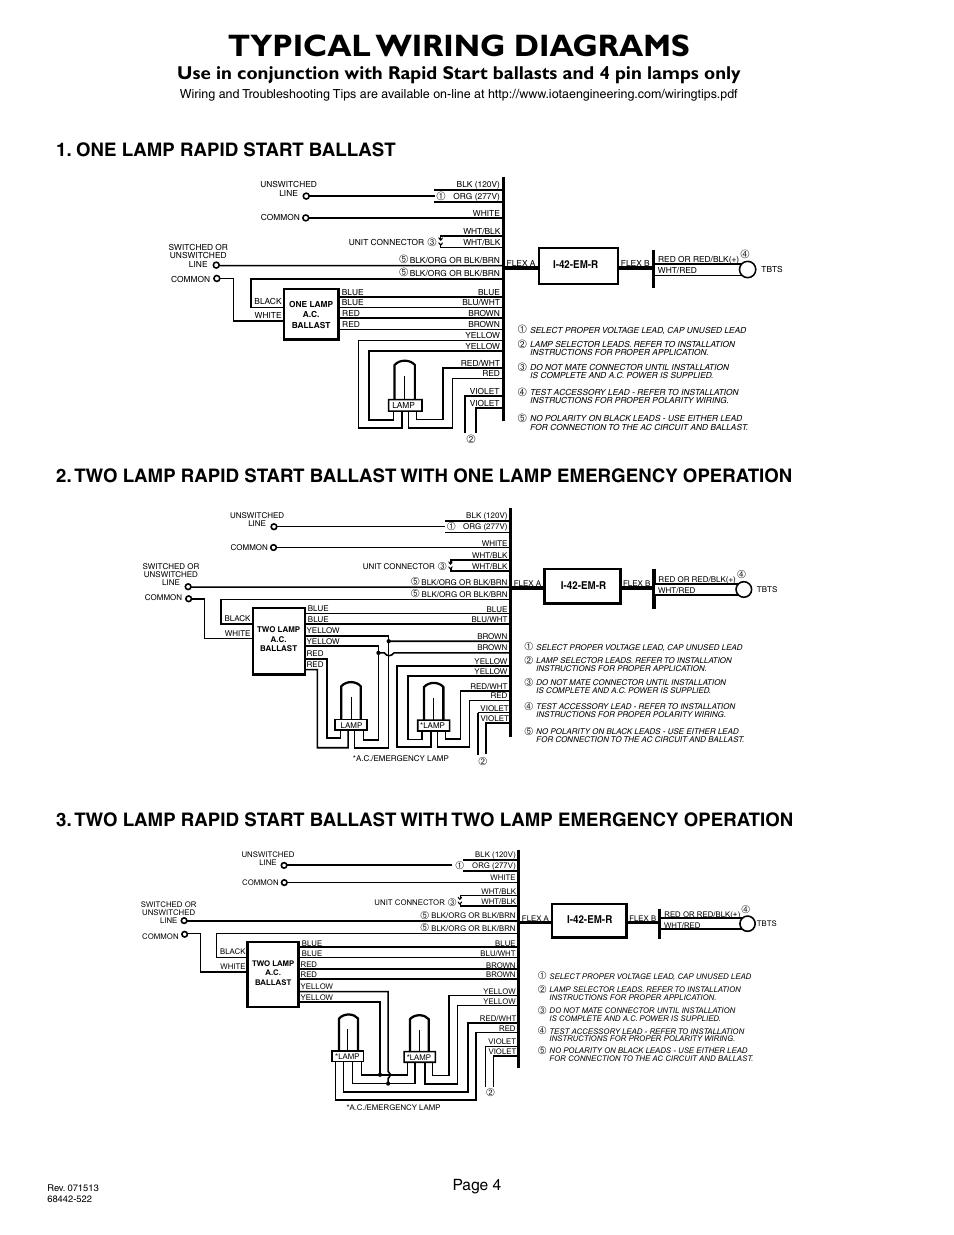 hight resolution of  4 lamps wiring diagram rapid start ballast iota i32 emergency ballast wiring diagram rapid start ballast wiring diagram on advance ballast diagram